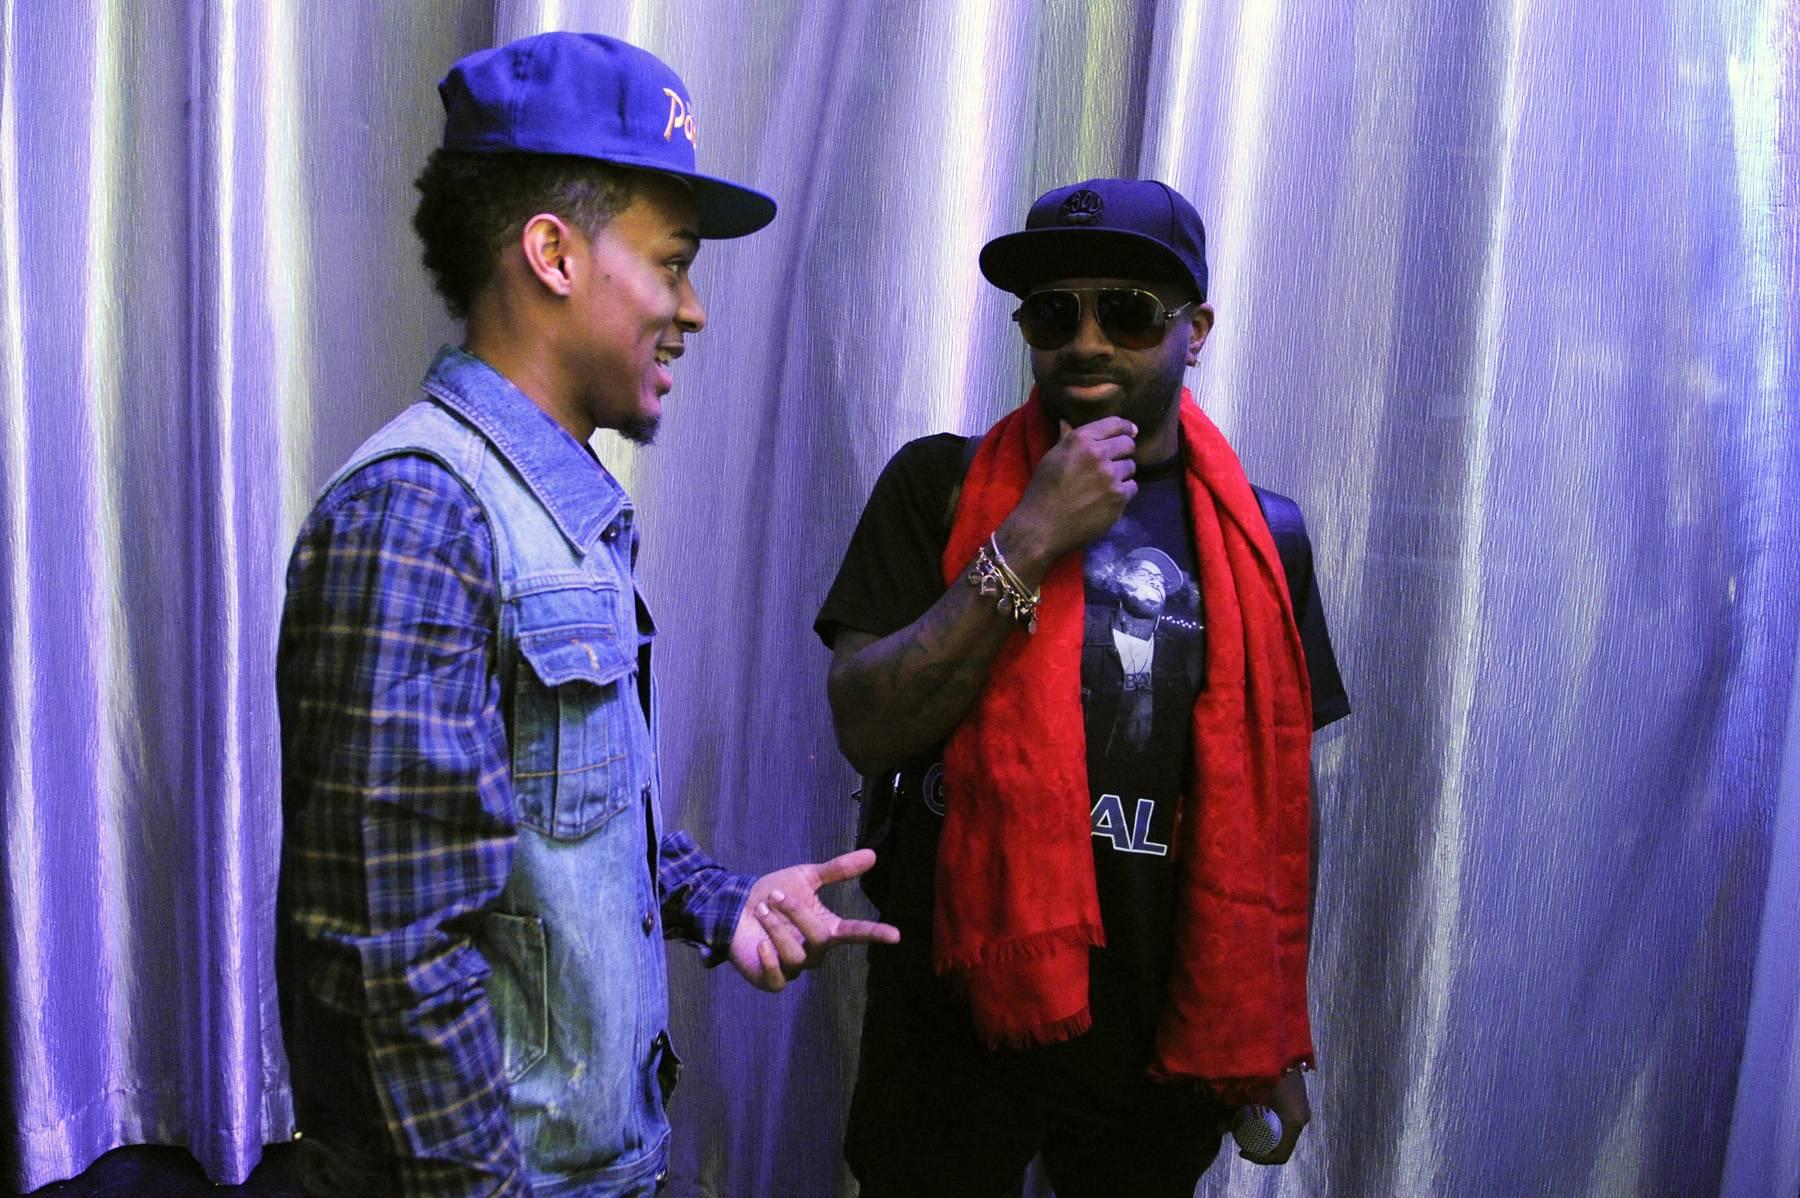 Big Bro - Bow Wow and Jermaine Dupree backstage at 106 & Park, January 23, 2012. (Photo: John Ricard / BET)